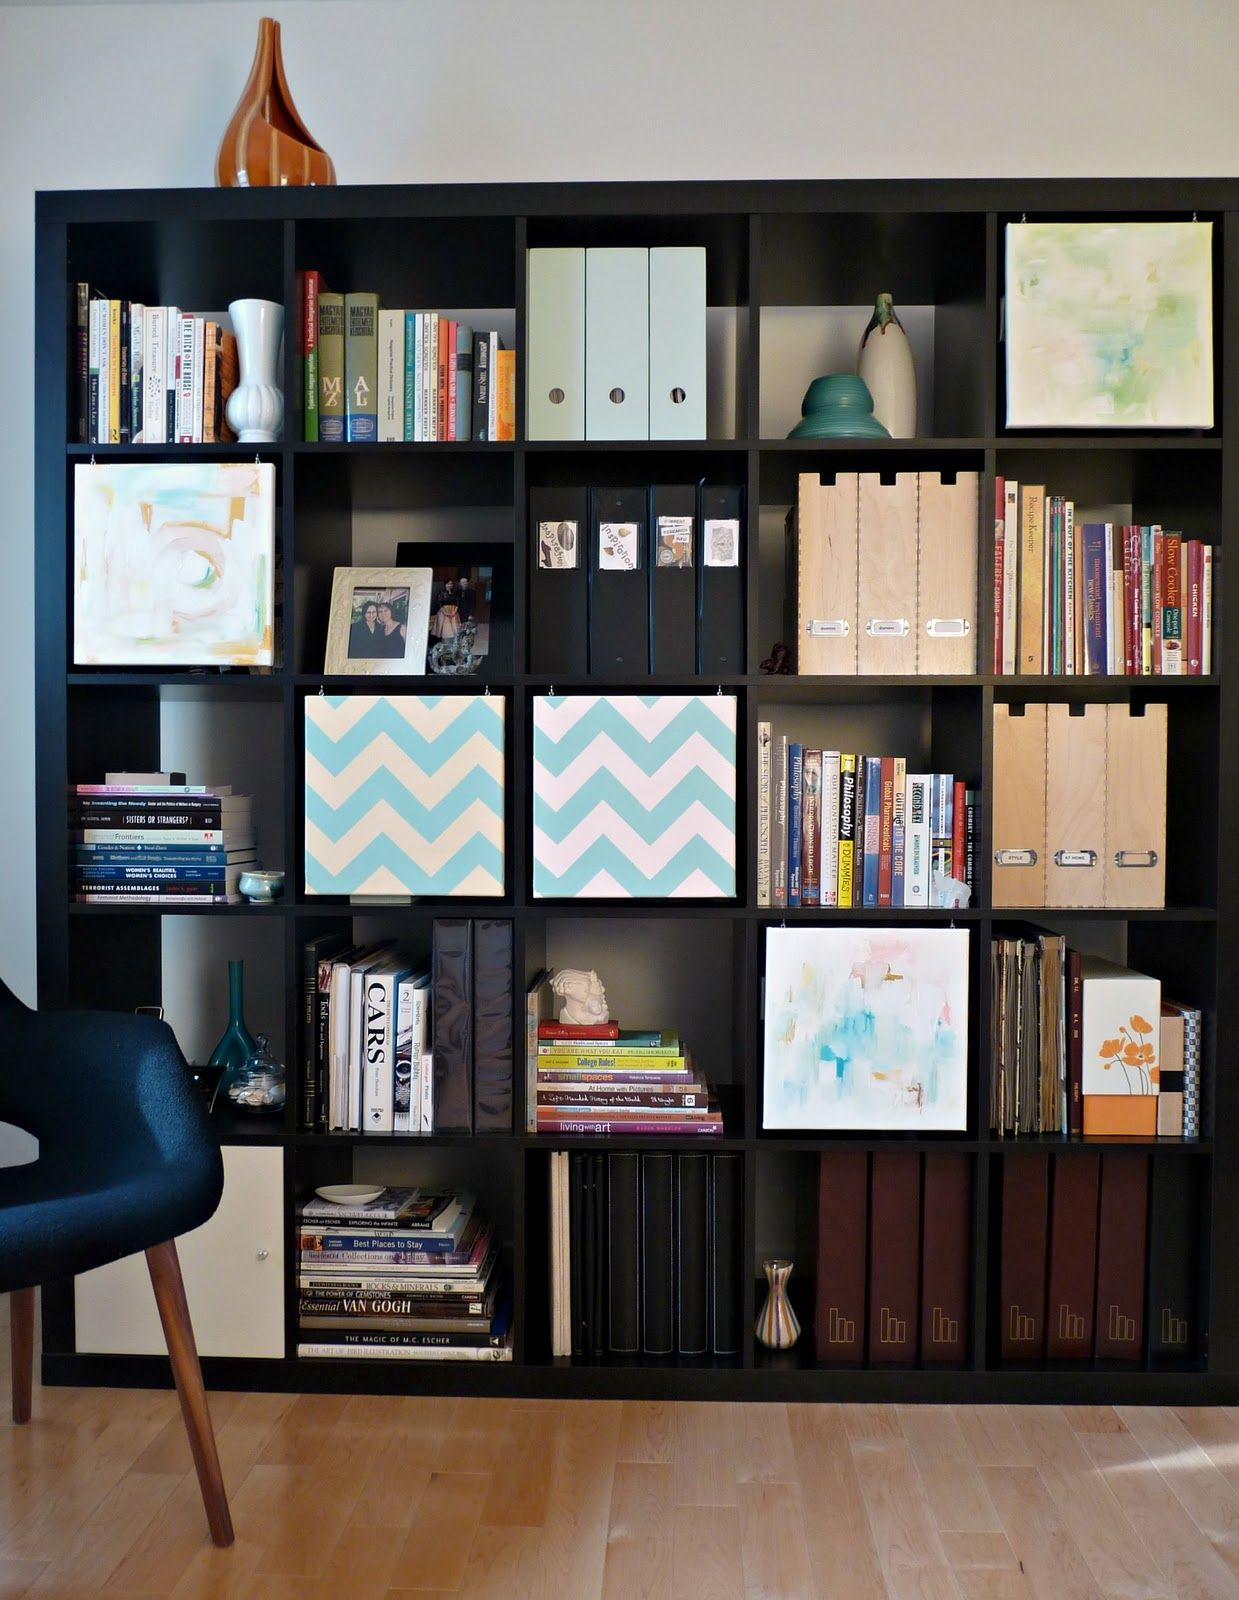 Arbeitszimmer ikea expedit  Dans le Lakehouse: My Artful Ikea Expedit Hack | Kallax kast ...